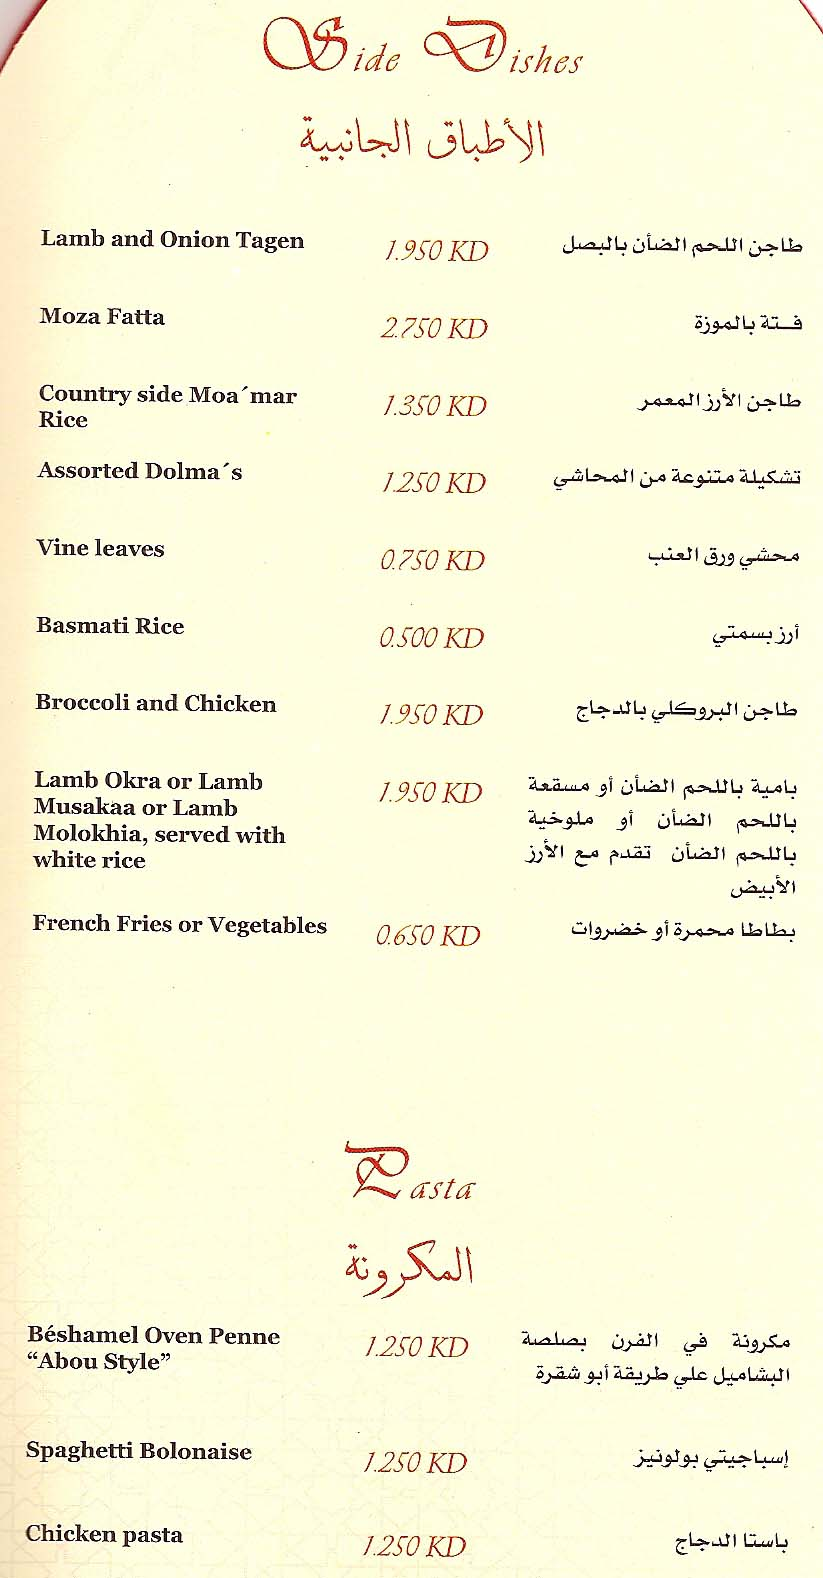 Abou Shakra Restaurant: Creating Customer Value Essay Sample